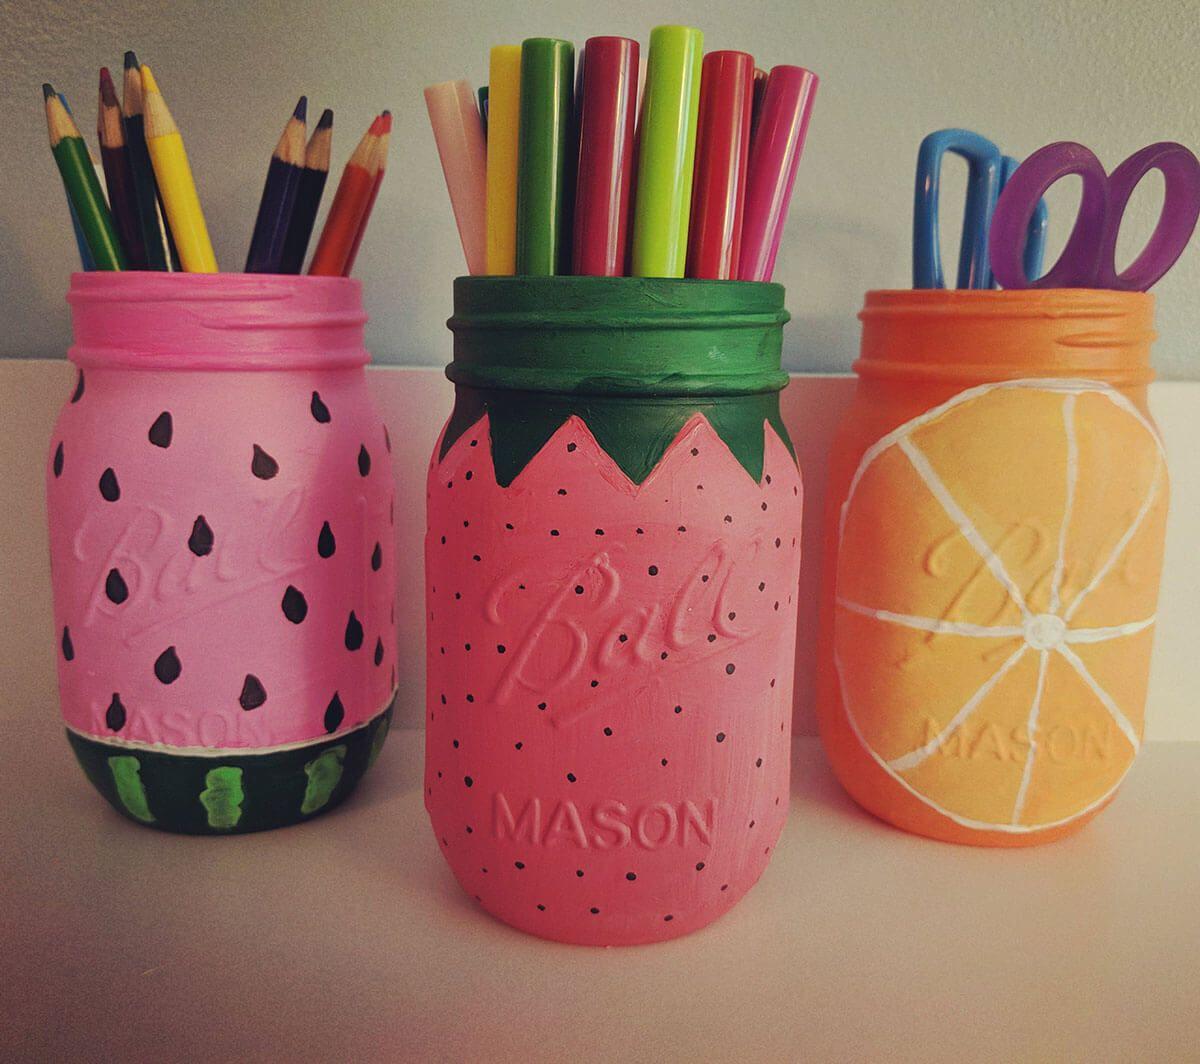 28 Fabulous Painted Mason Jar Ideas From Cutesy To Classic Mason Jar Decorations Mason Jar Art Easy Mason Jar Crafts